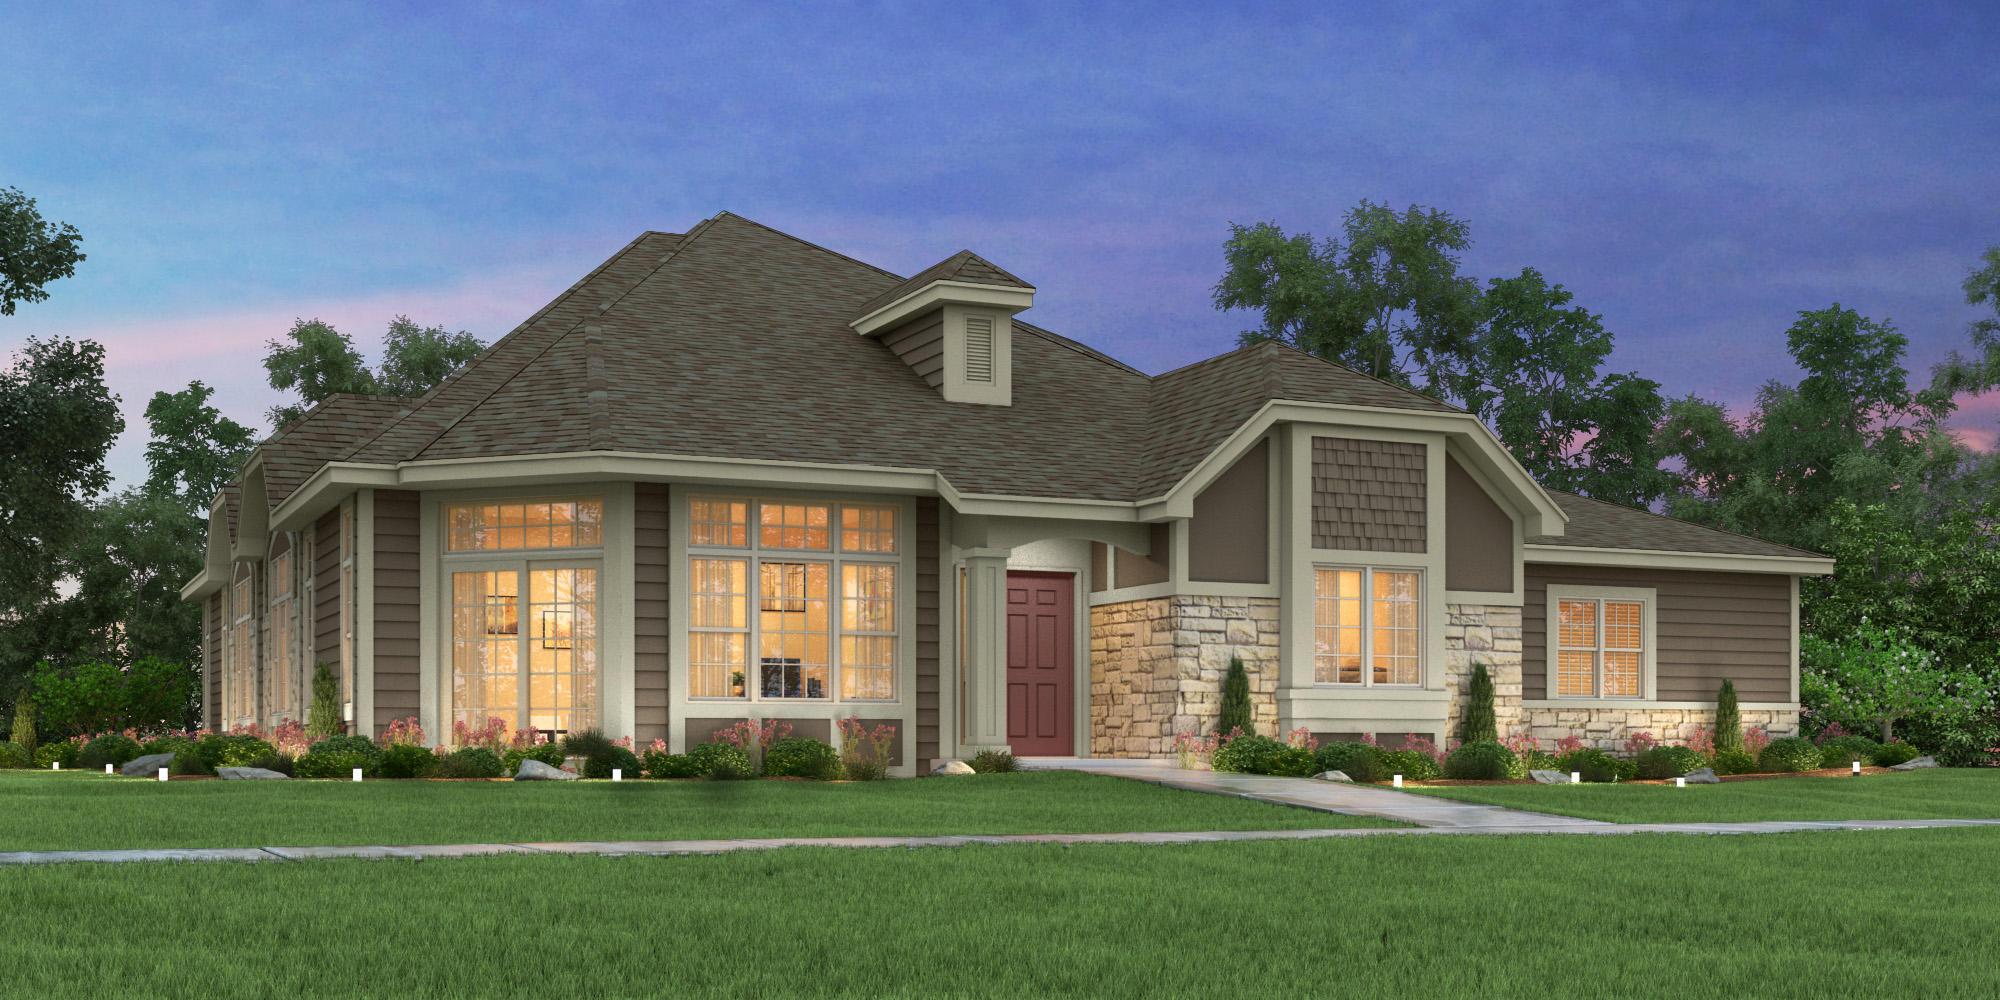 13745 Creekside Pass, Brookfield, Wisconsin 53005, 2 Bedrooms Bedrooms, 5 Rooms Rooms,2 BathroomsBathrooms,Condominiums,For Sale,Creekside Pass,1,1720375